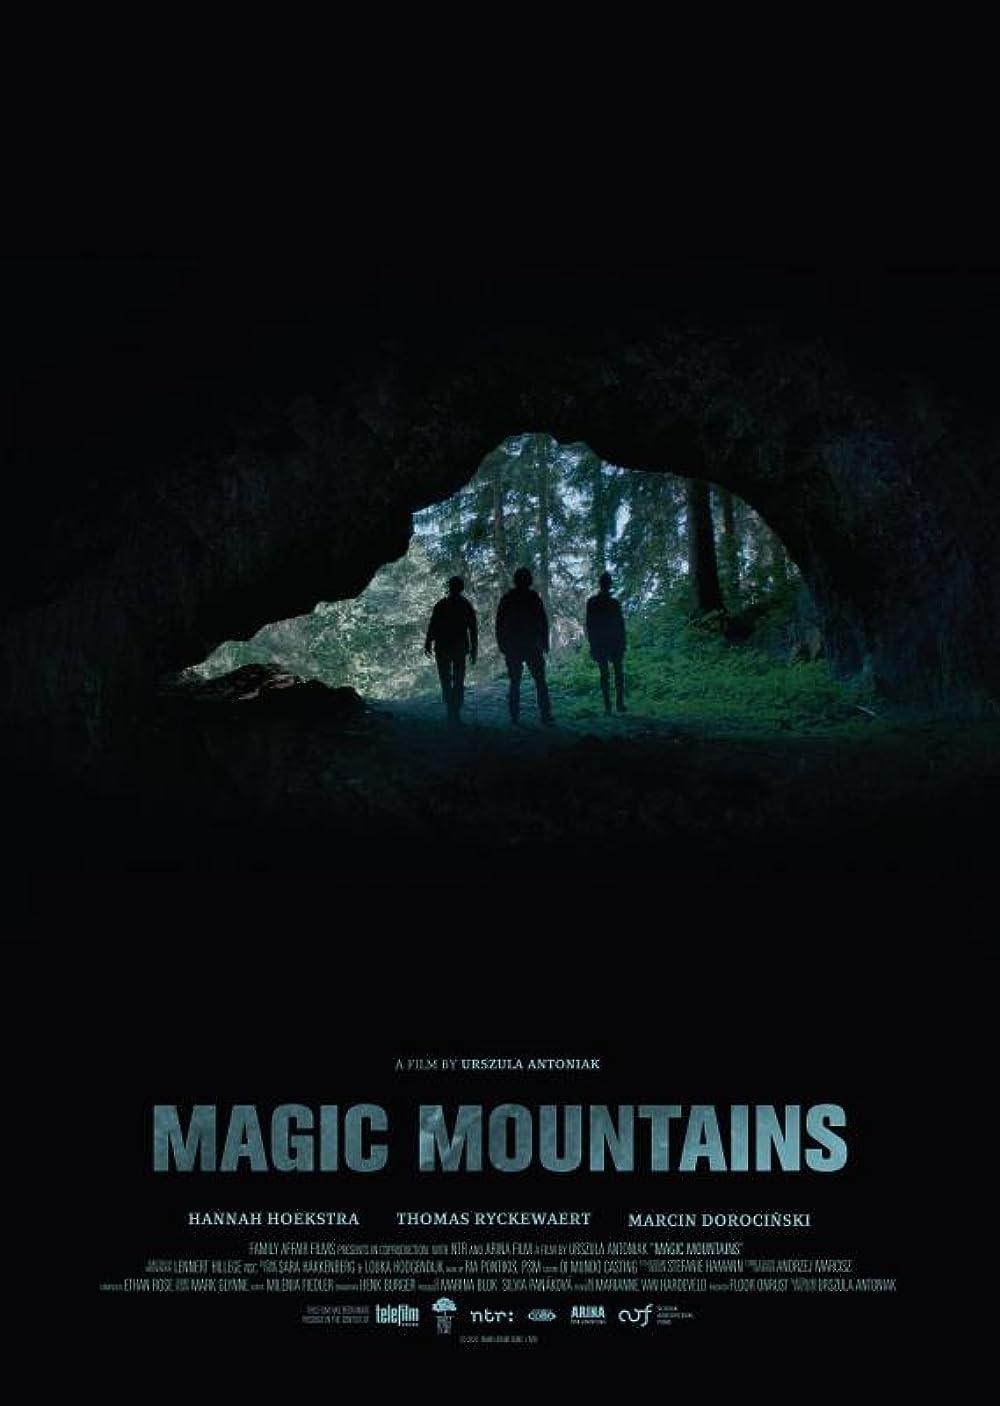 Magic Mountains (2020) Telugu Dubbed (Voice Over) & English [Dual Audio] WebRip 720p [1XBET]